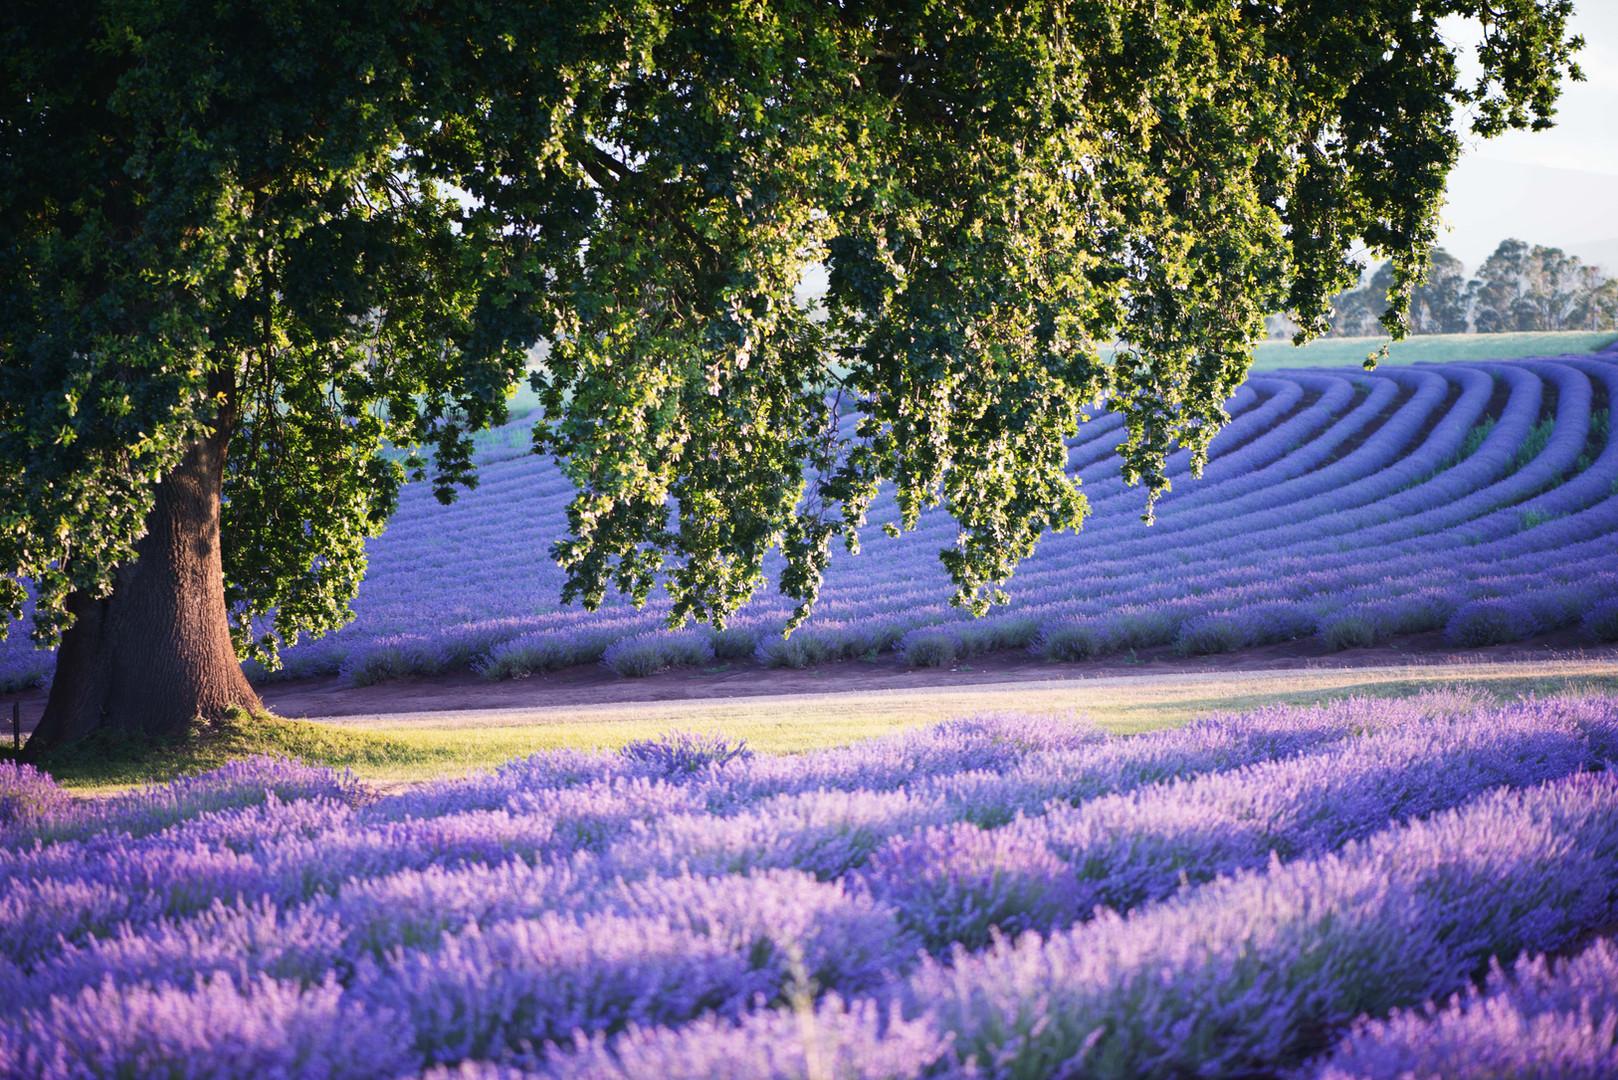 1Glorious oak - photo credit Ockert Le R